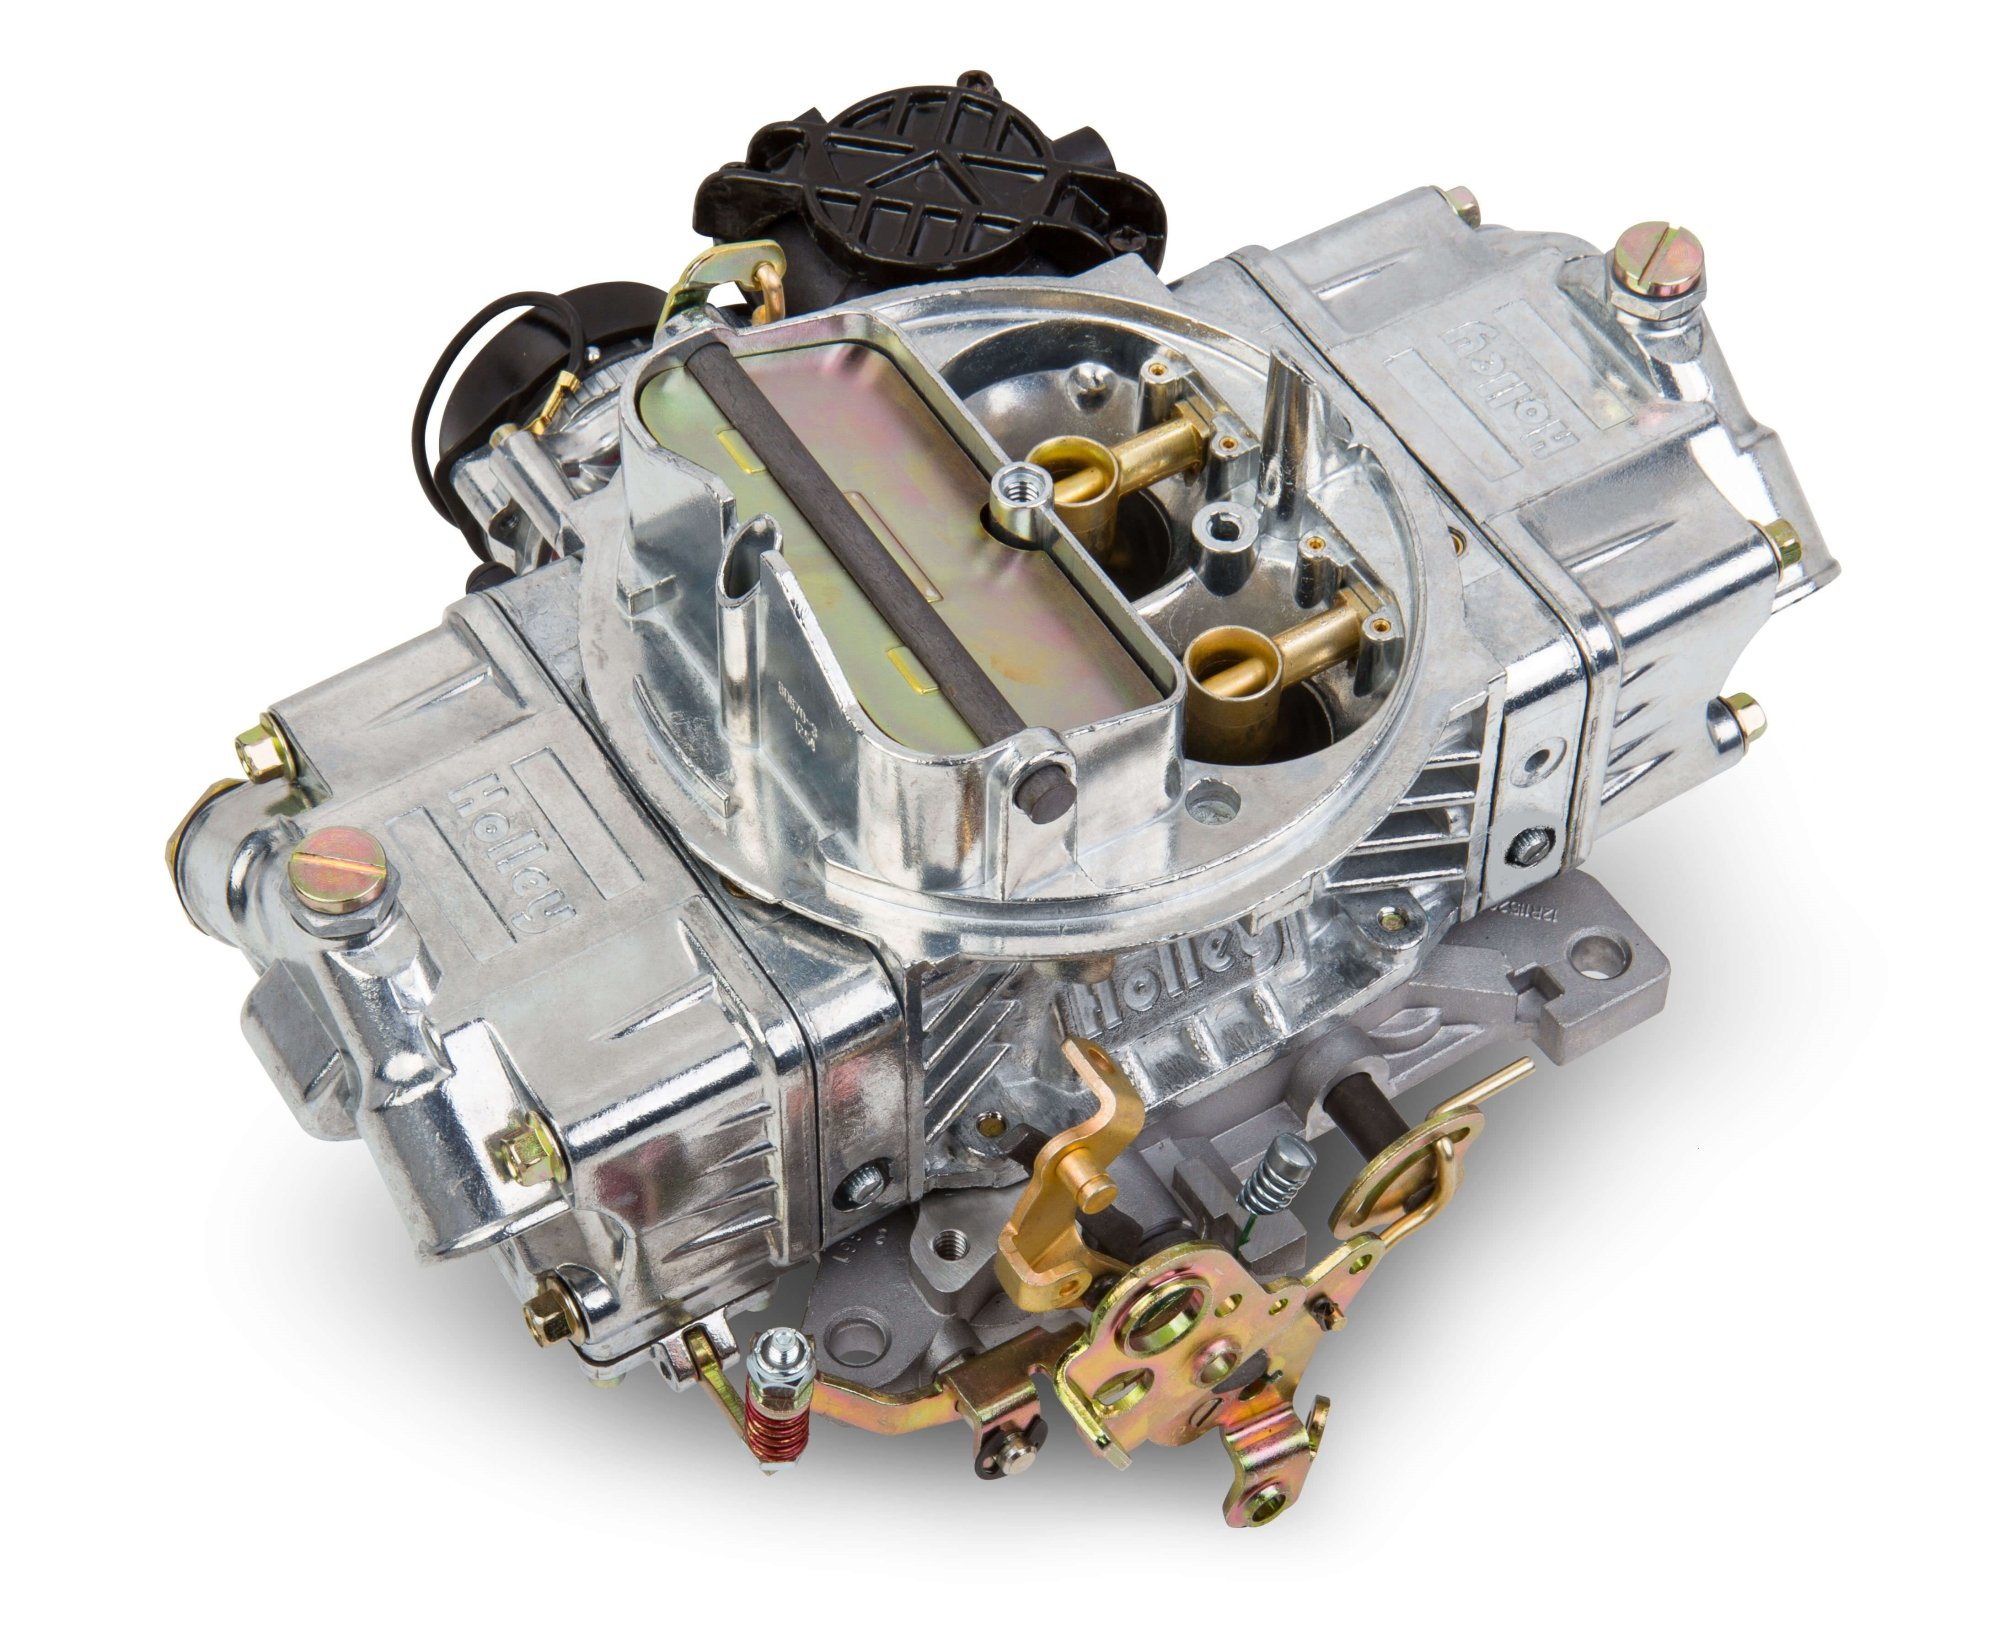 hight resolution of 0 80670 670 cfm street avenger carburetor image